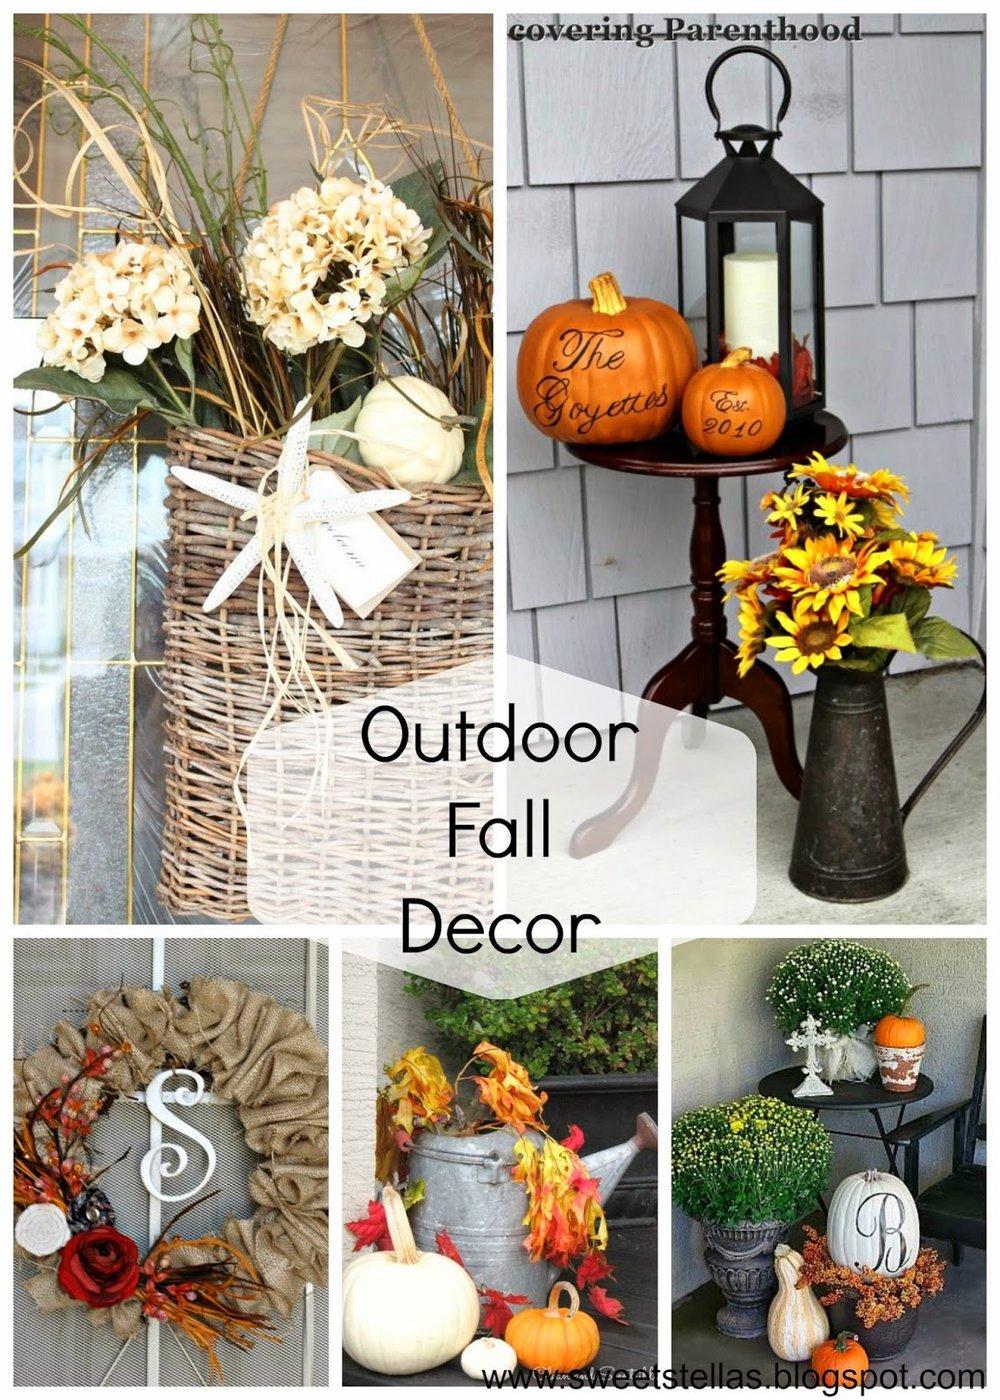 Outdoor Fall Decor Ideas On Pinterest Homedecor Outdoor